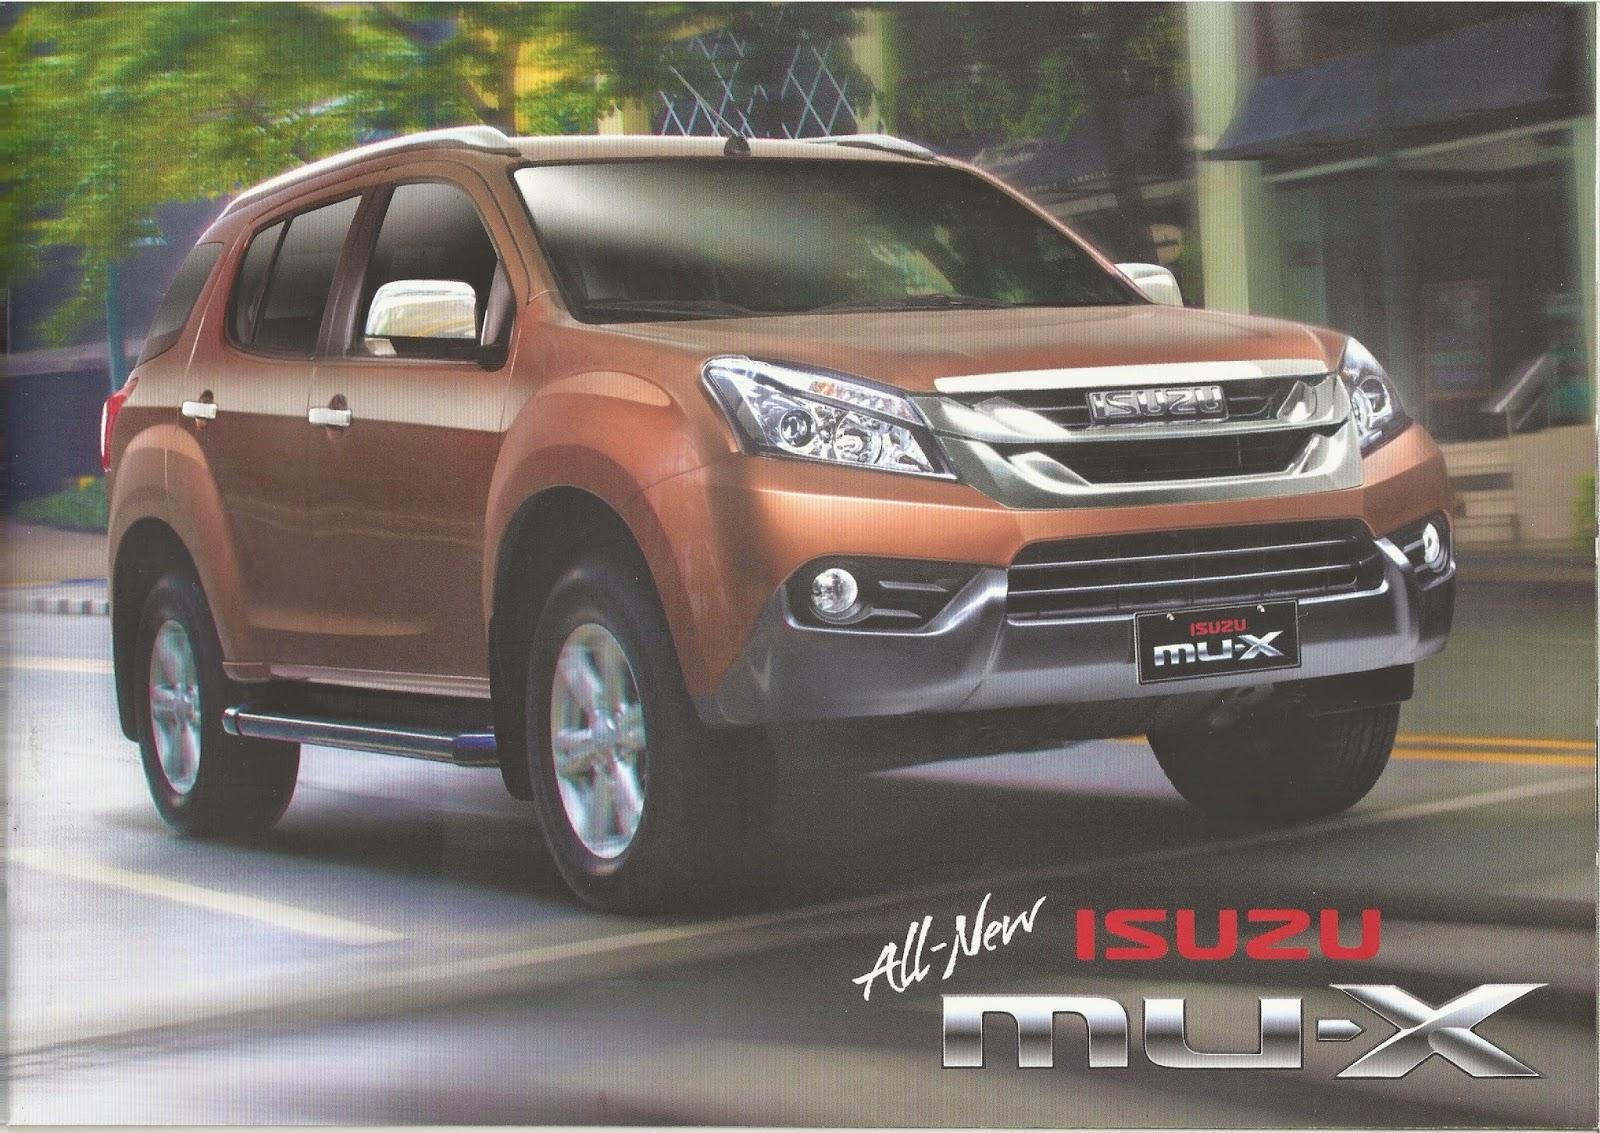 release reviews and models on 2014 isuzu mu x lt s 2014 isuzu mu x